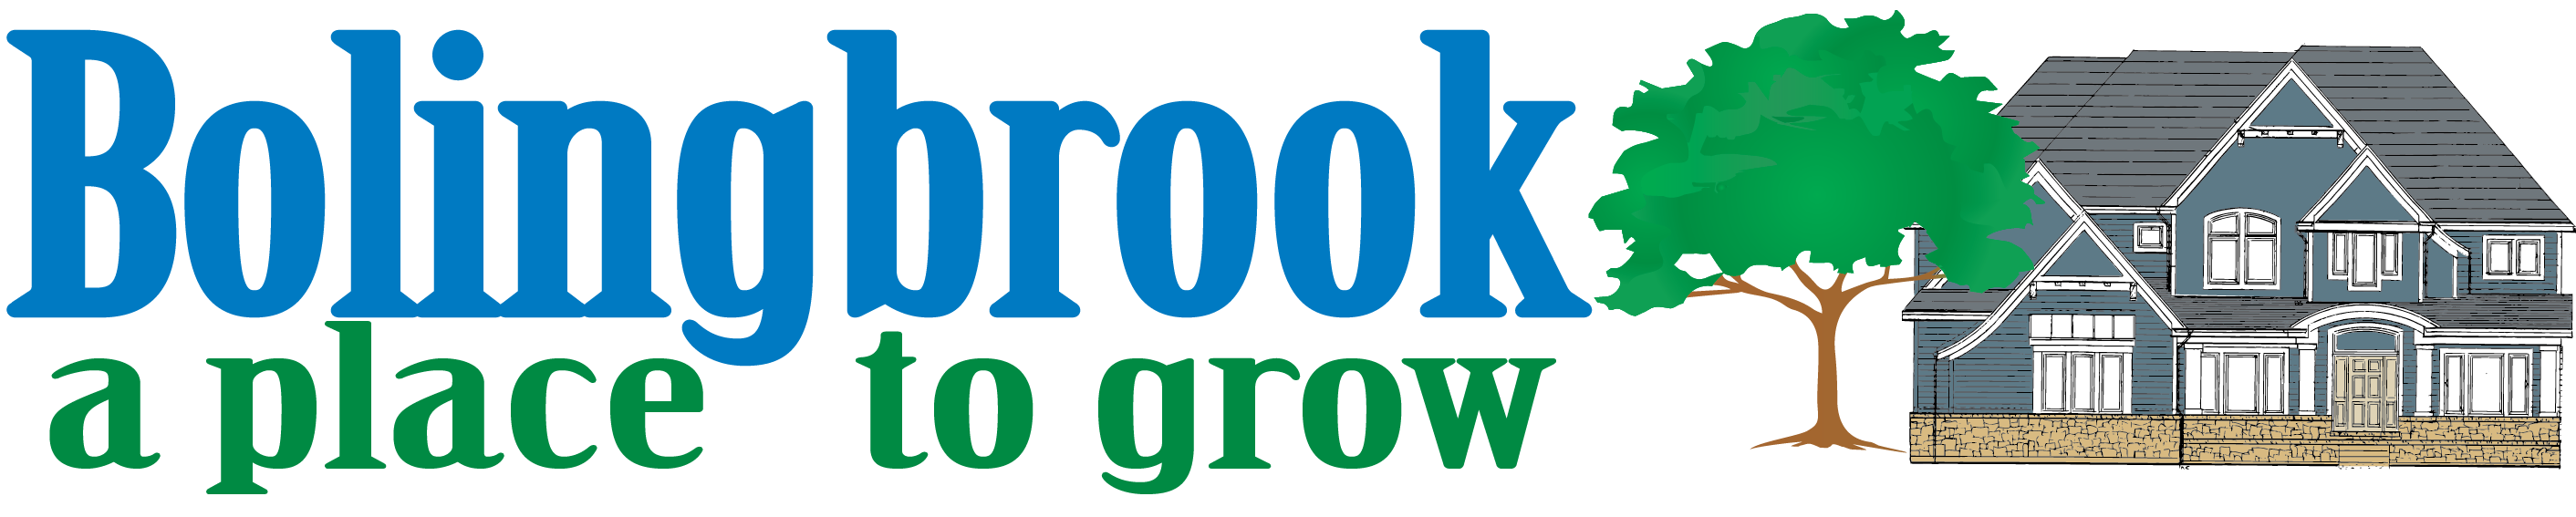 Visit Bolingbrook